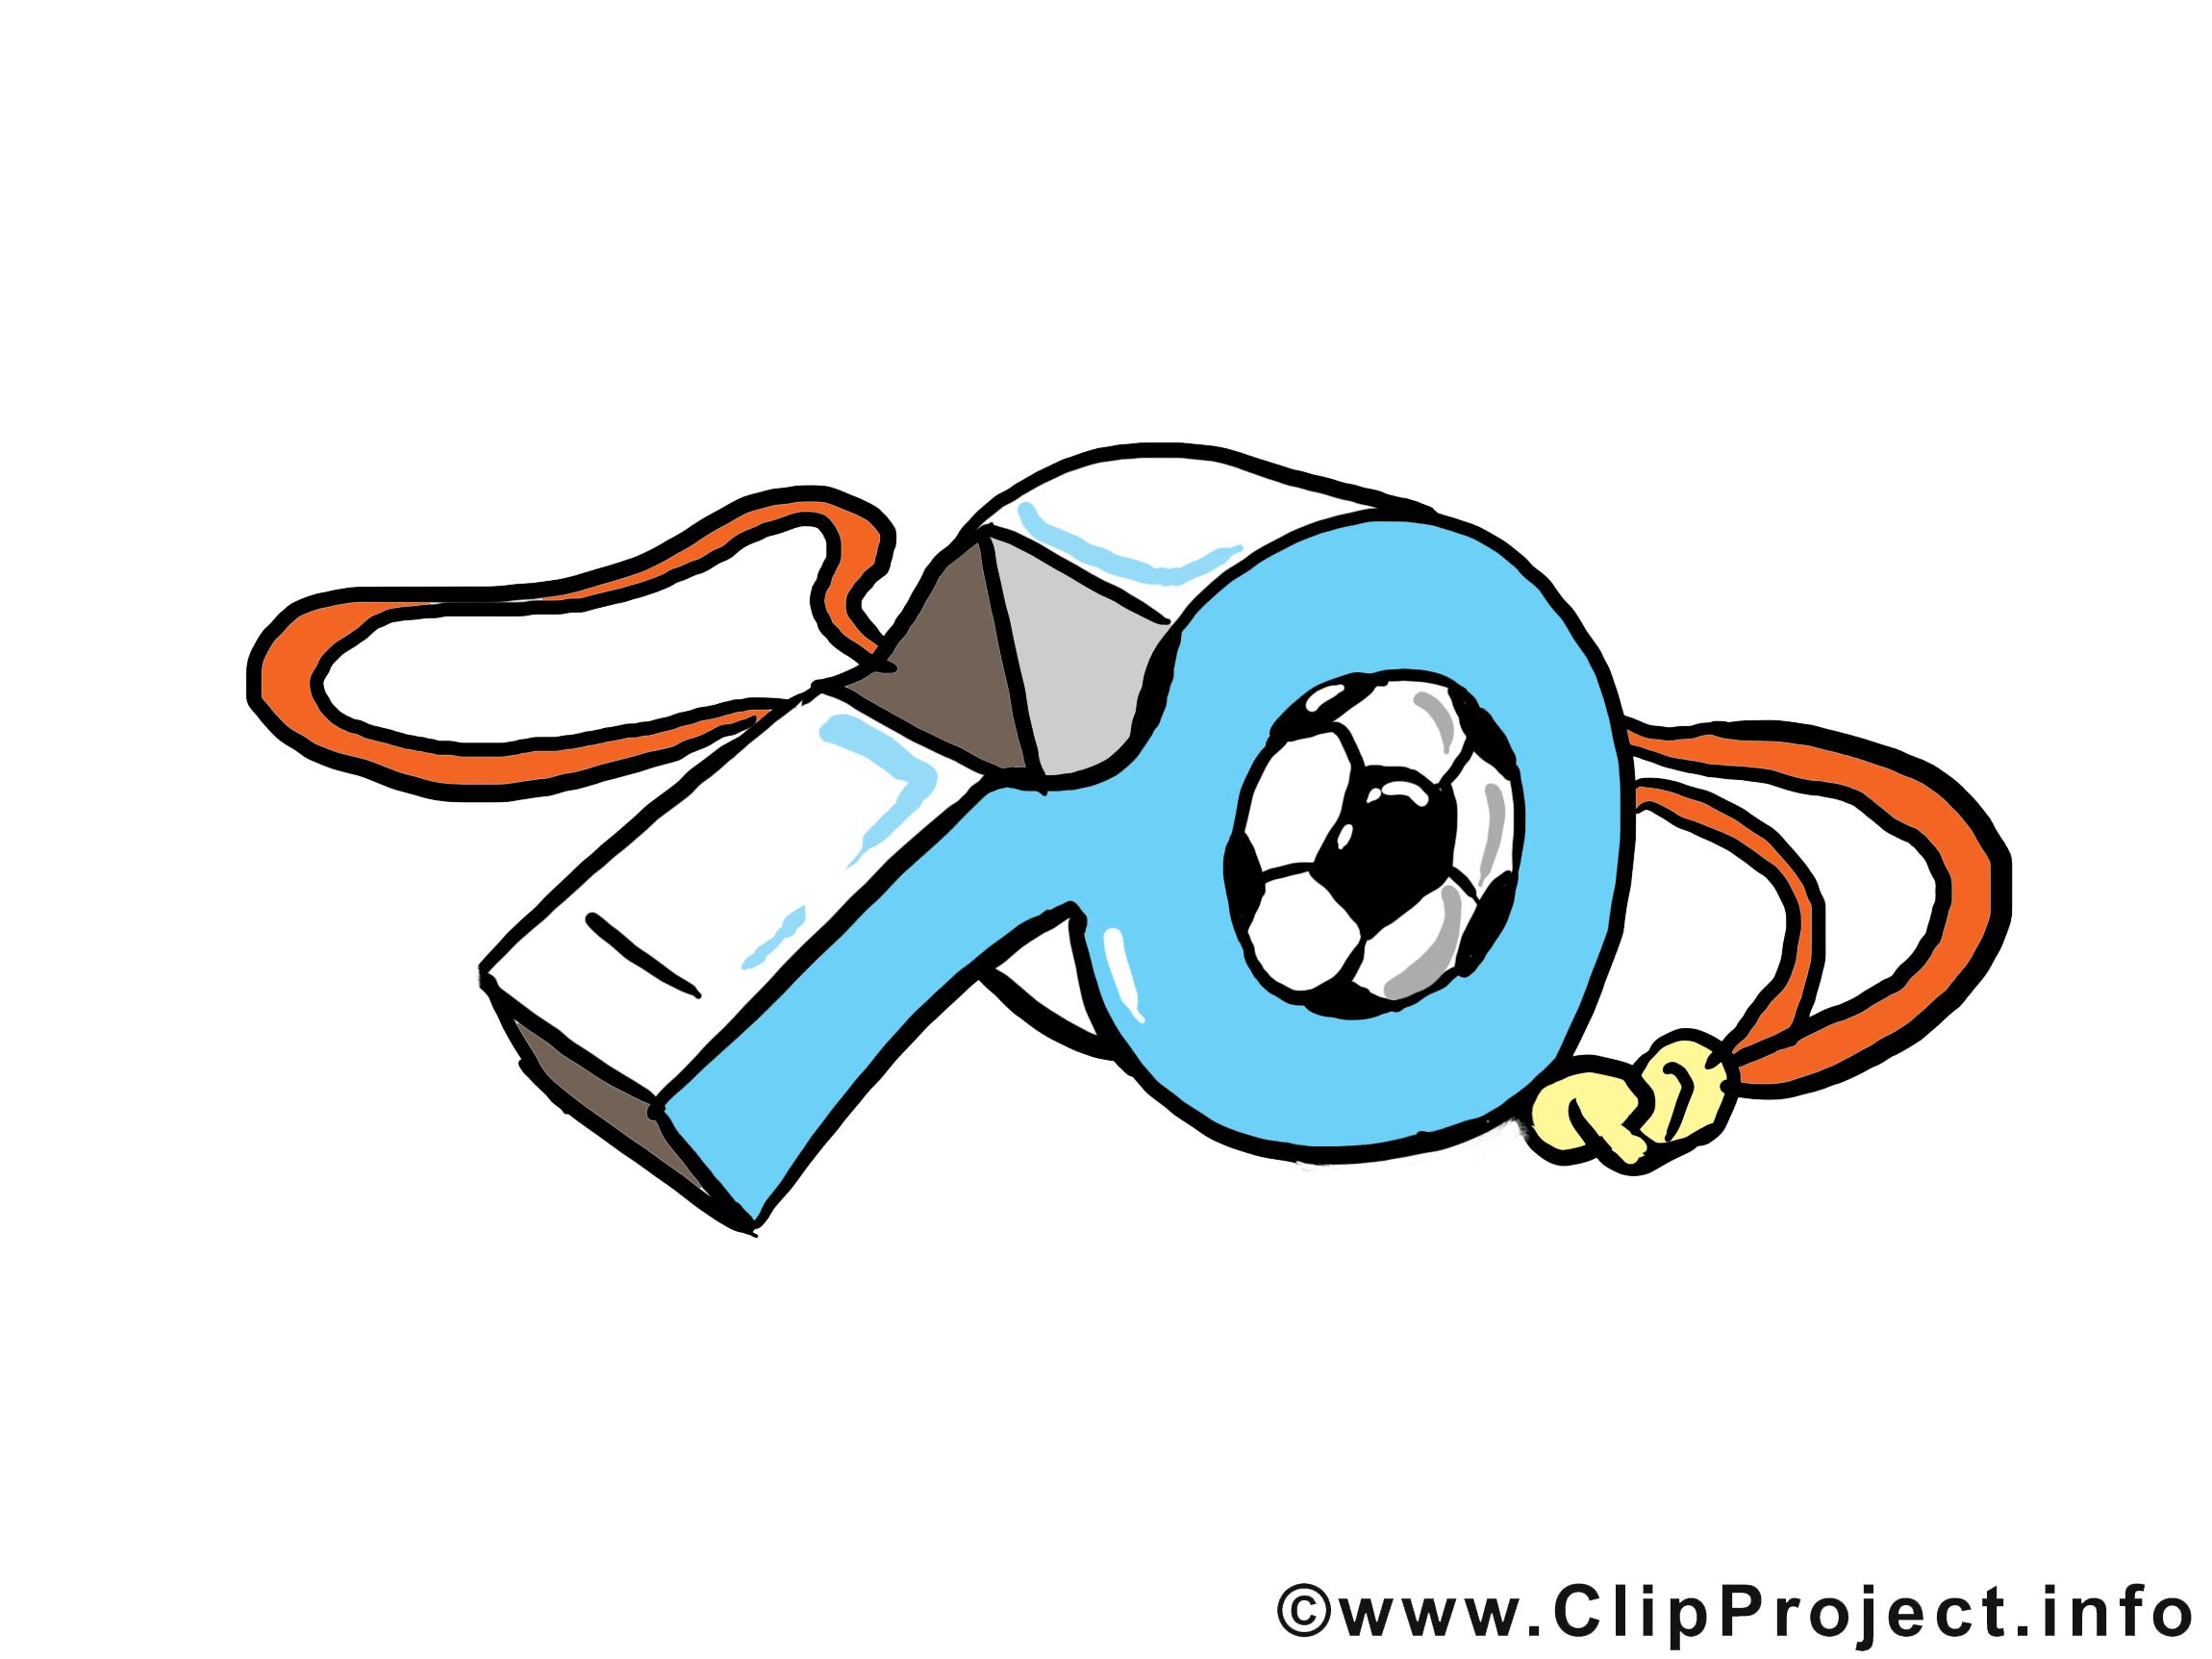 Sifflet clipart gratuit - Football images